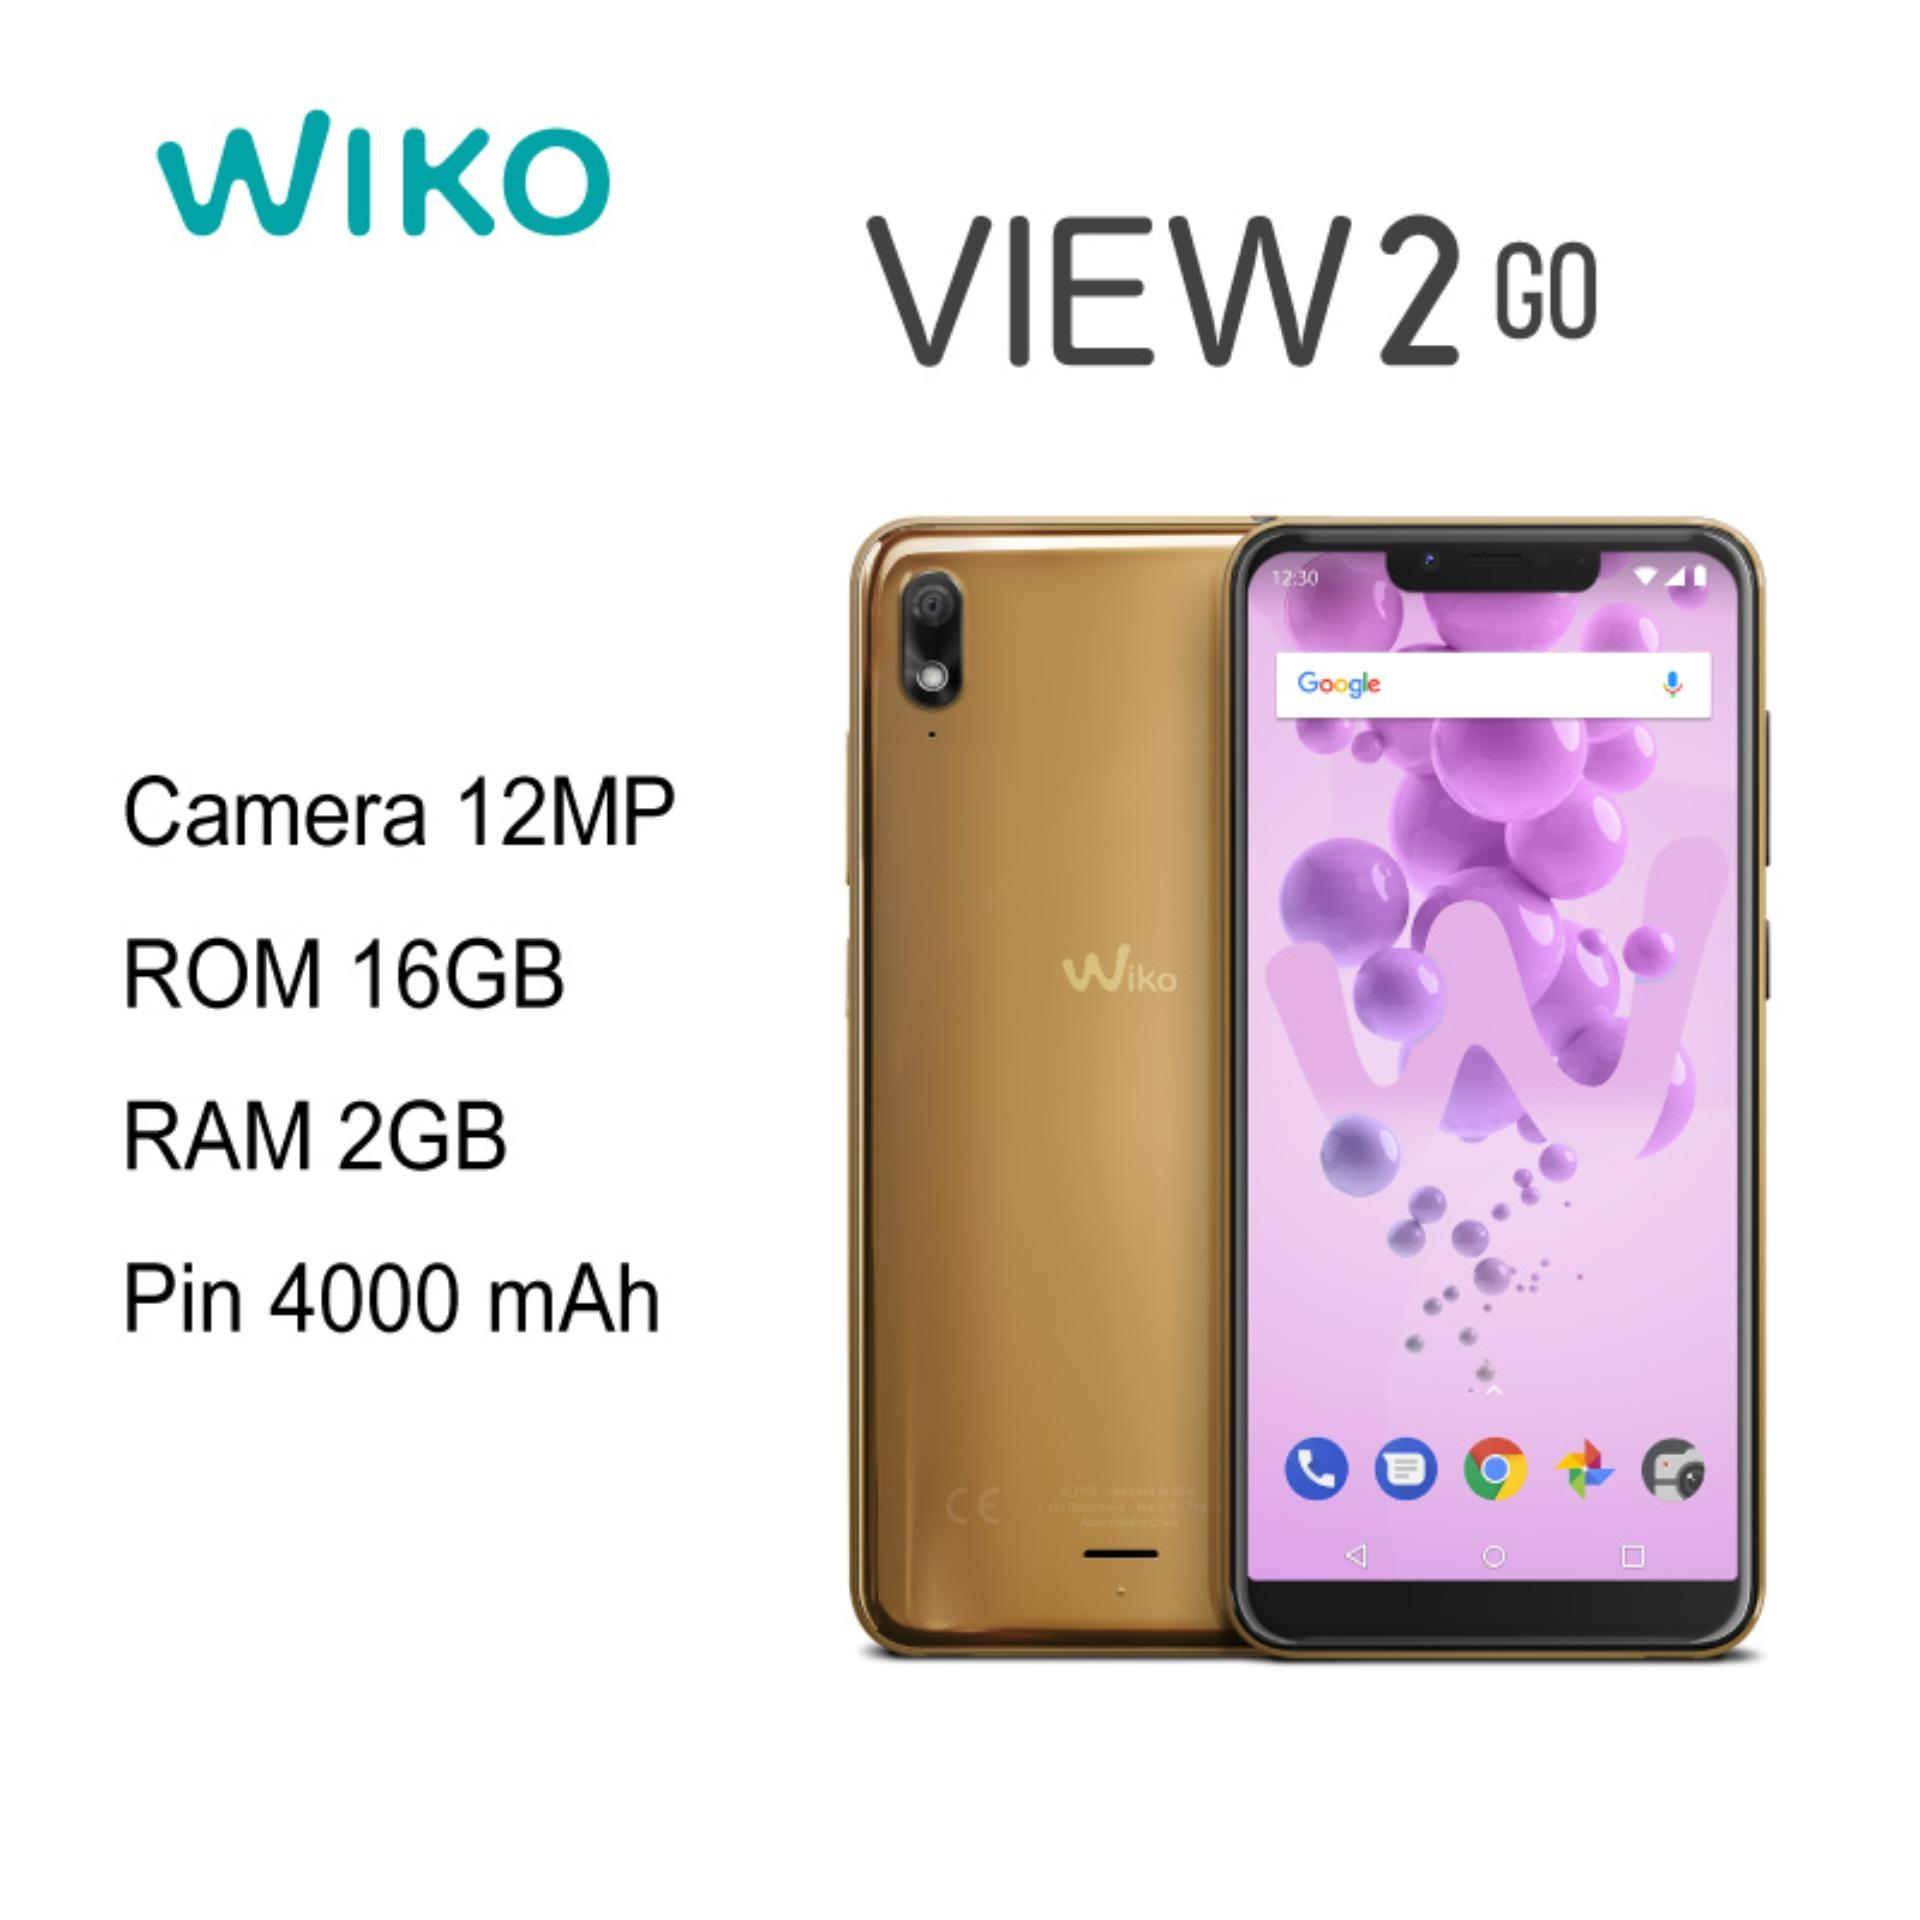 Điện thoại Wiko View 2 Go - 2GB RAM, 16GB, 5.93 inch